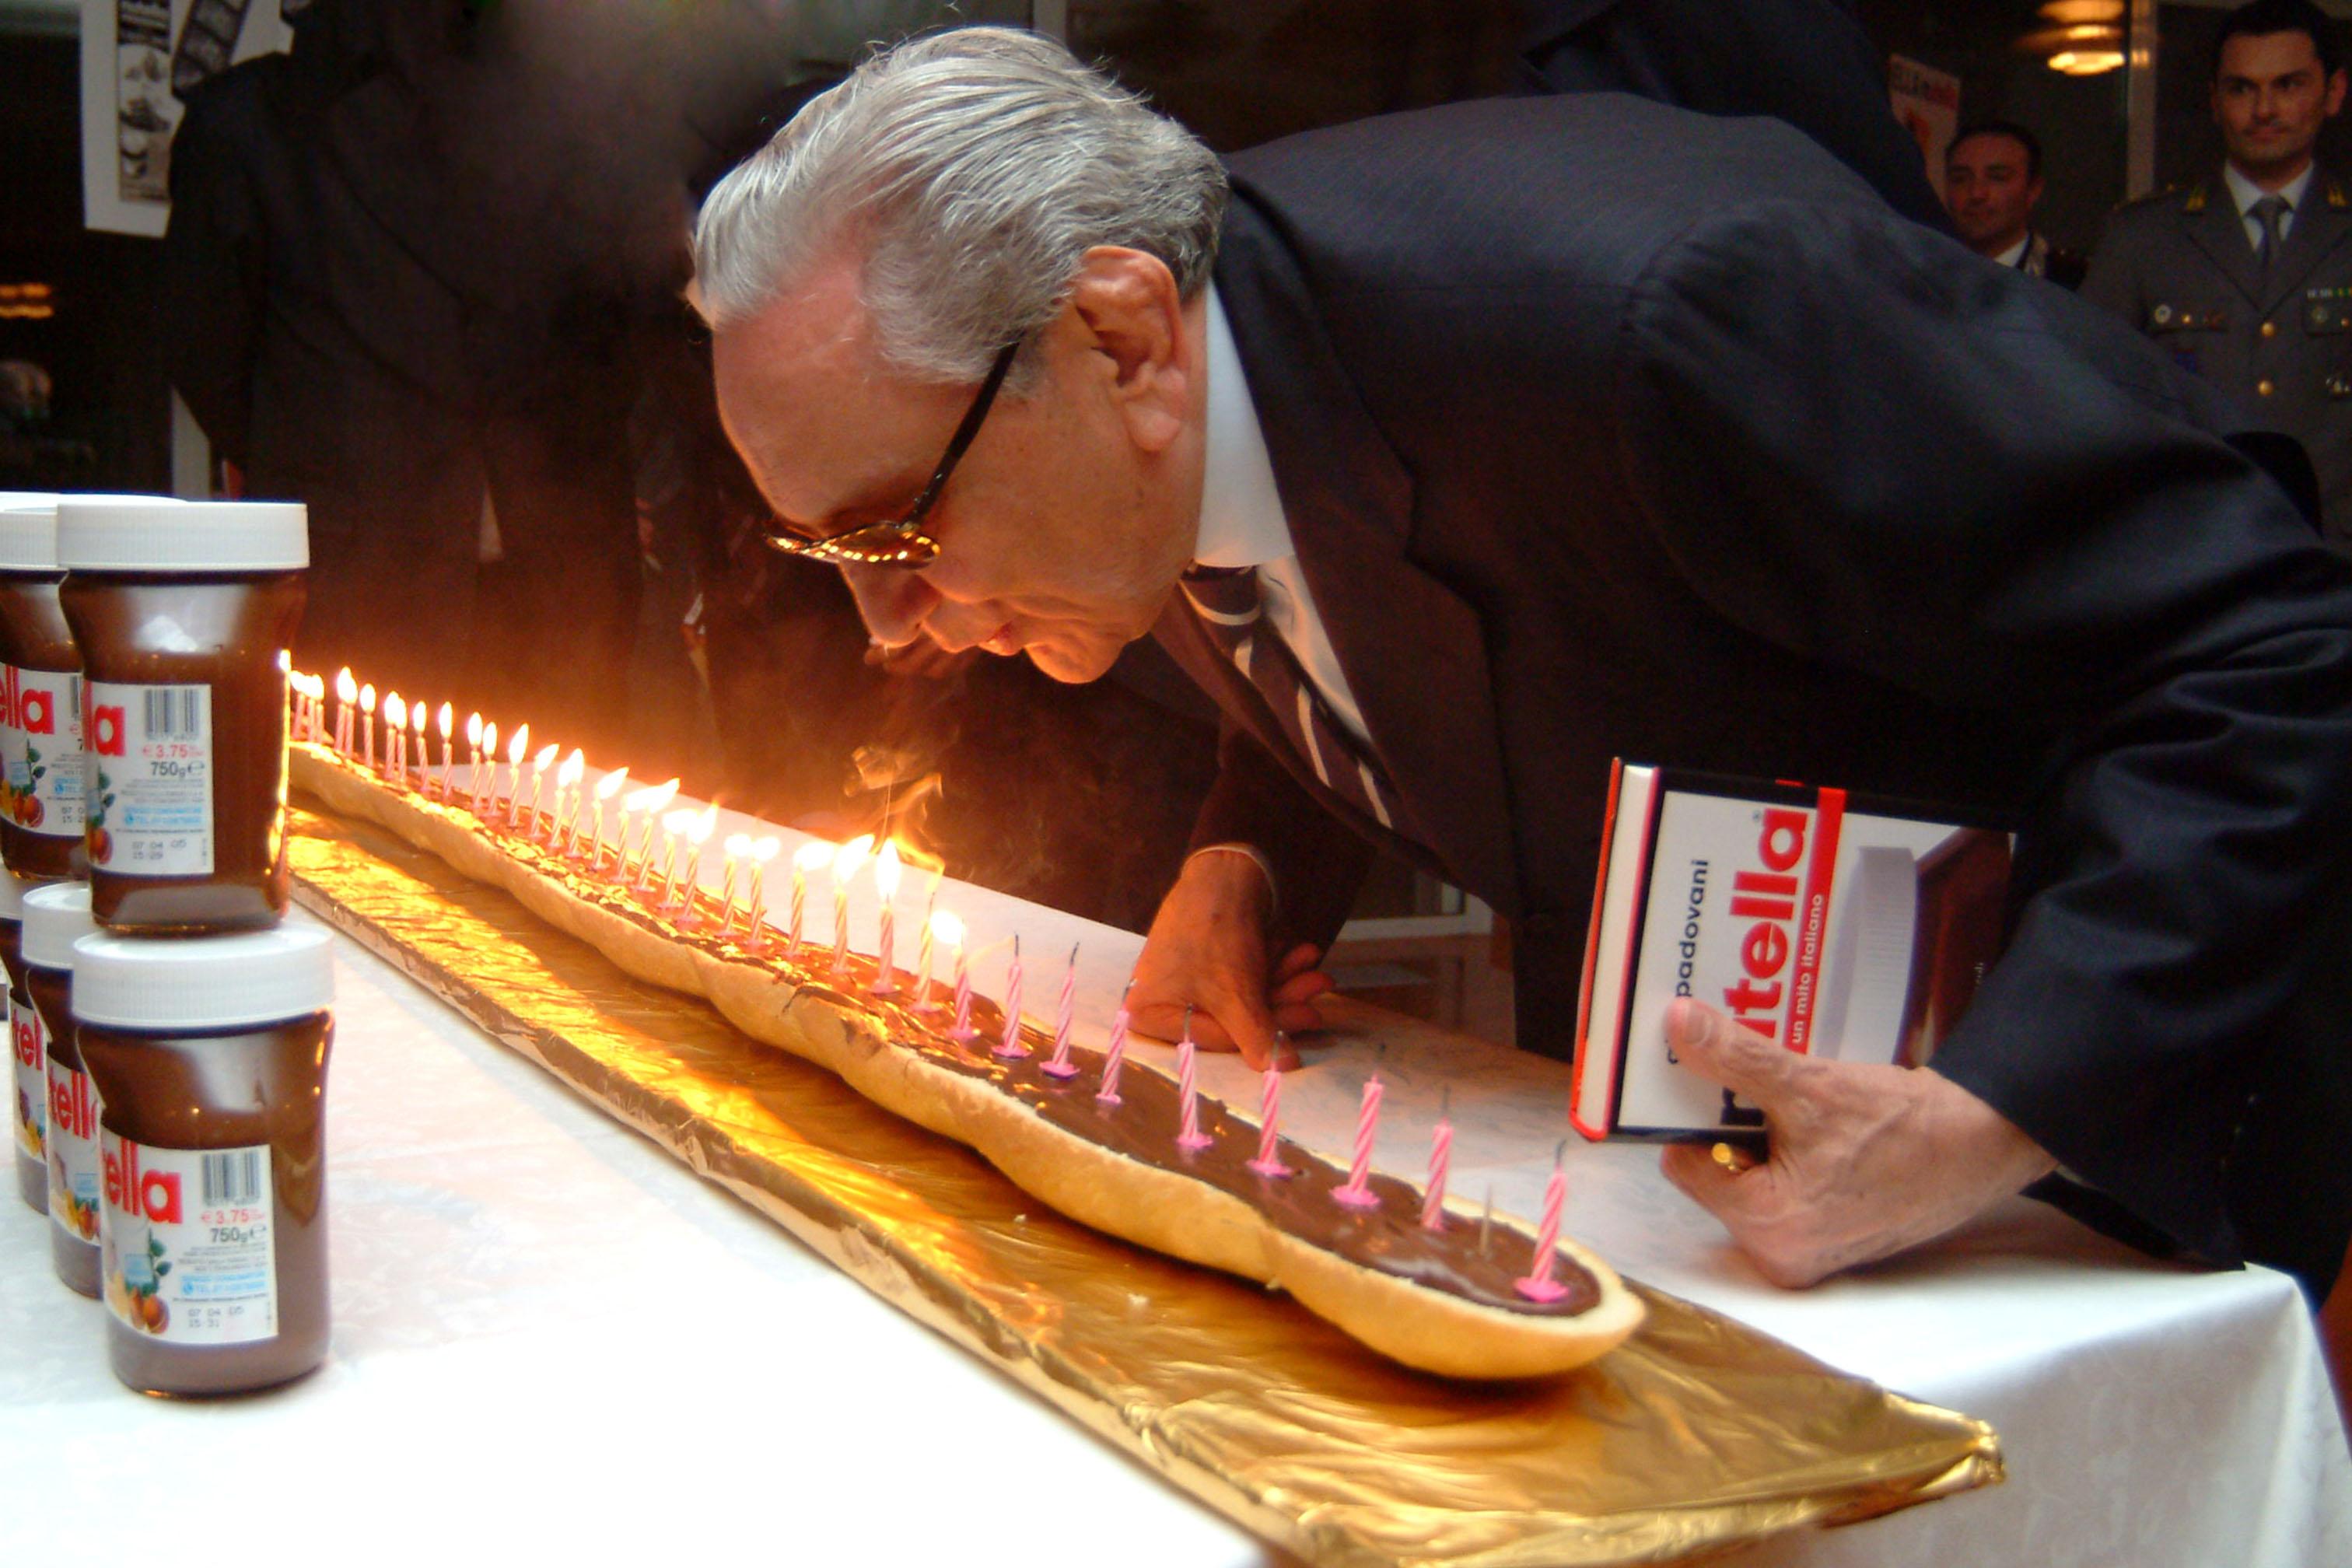 Belgium Chocolate Made In The Uk Legal